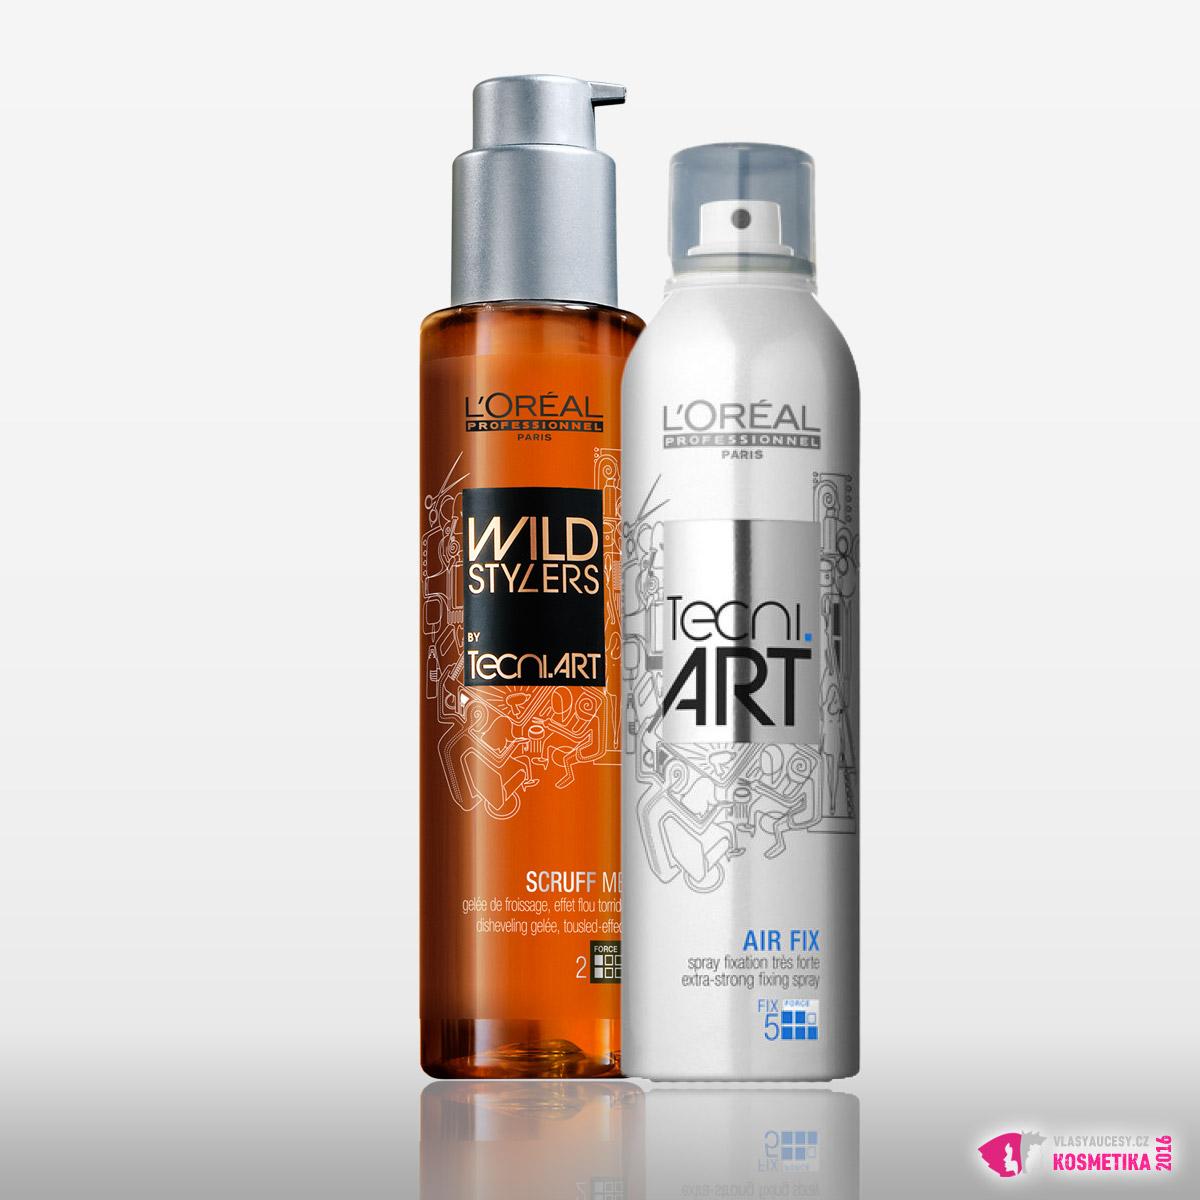 Použité produkty L'Oréal Professionnel: gel pro rozcuchaný vzhled Scruff Me a sprej se silnou fixací Air Fix